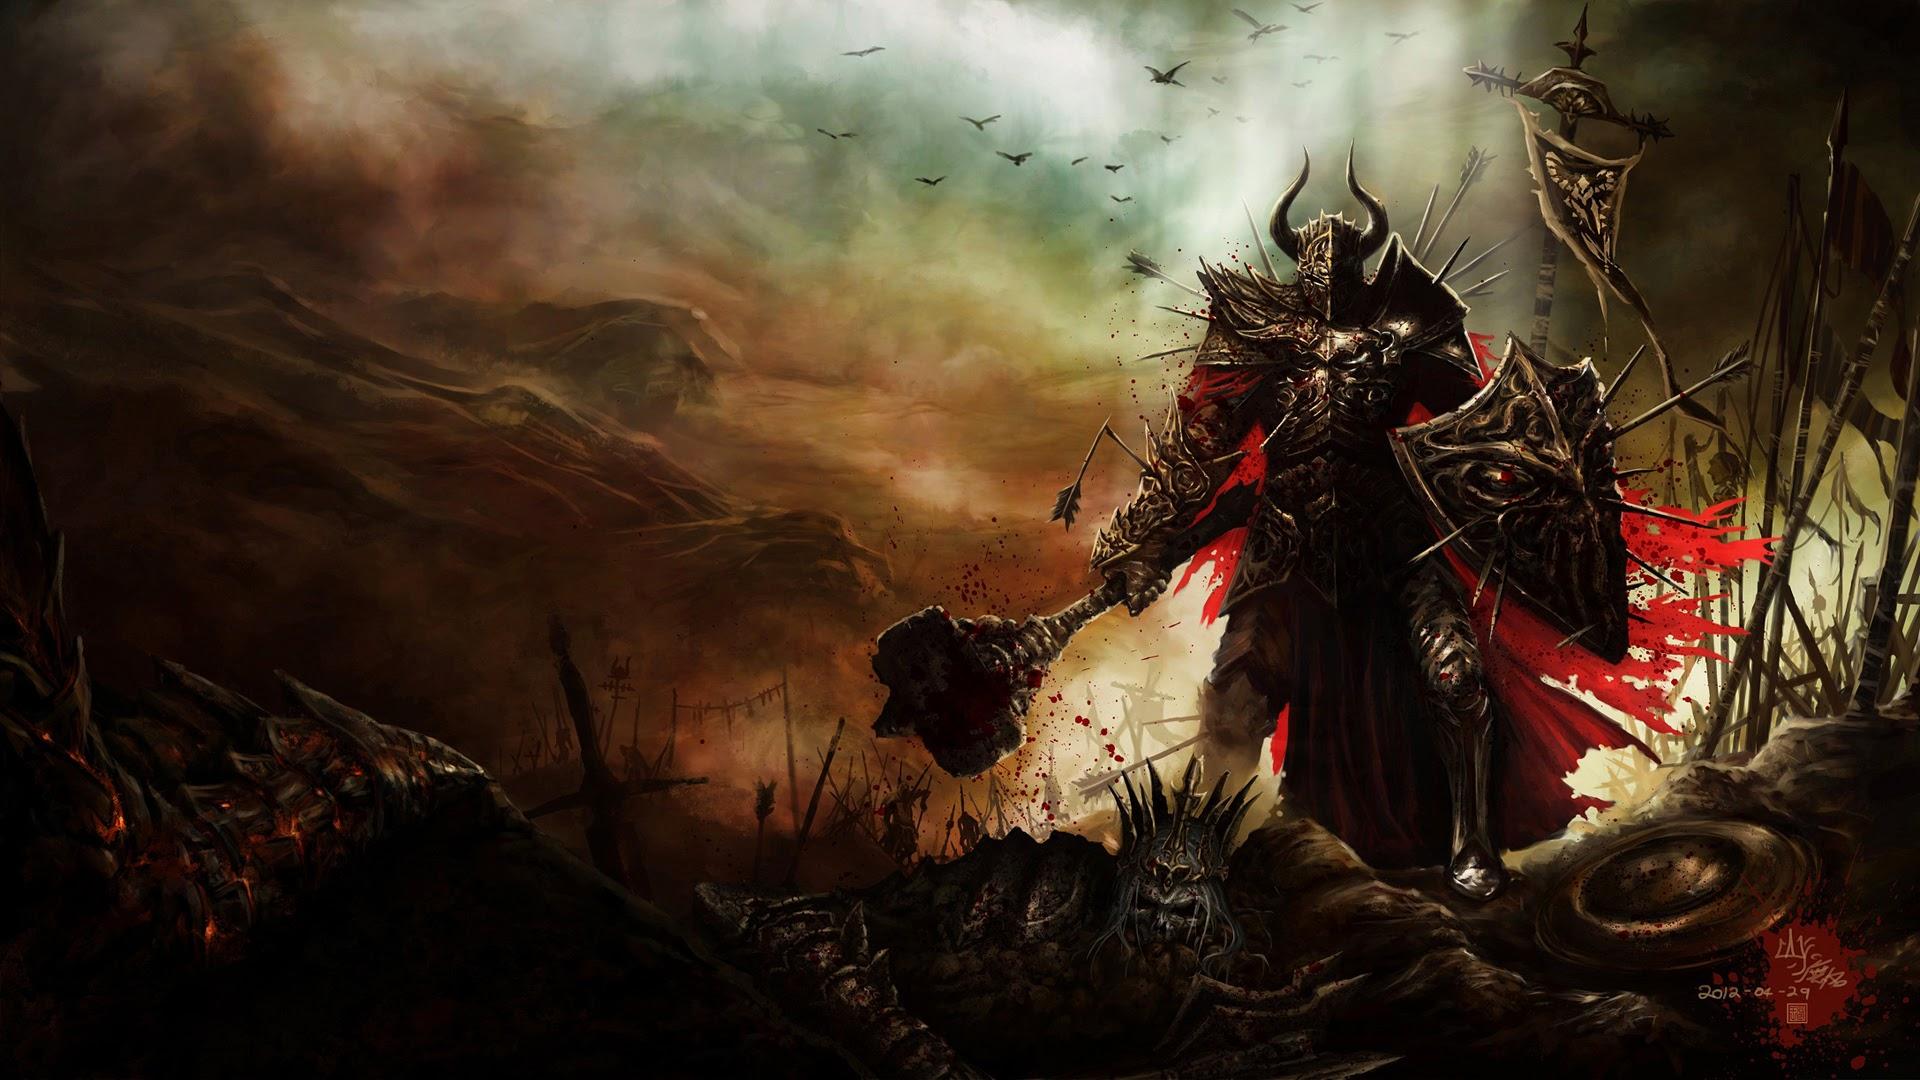 Diablo 3 Game Warrior Weapon Armor Shield A617 HD Wallpaper